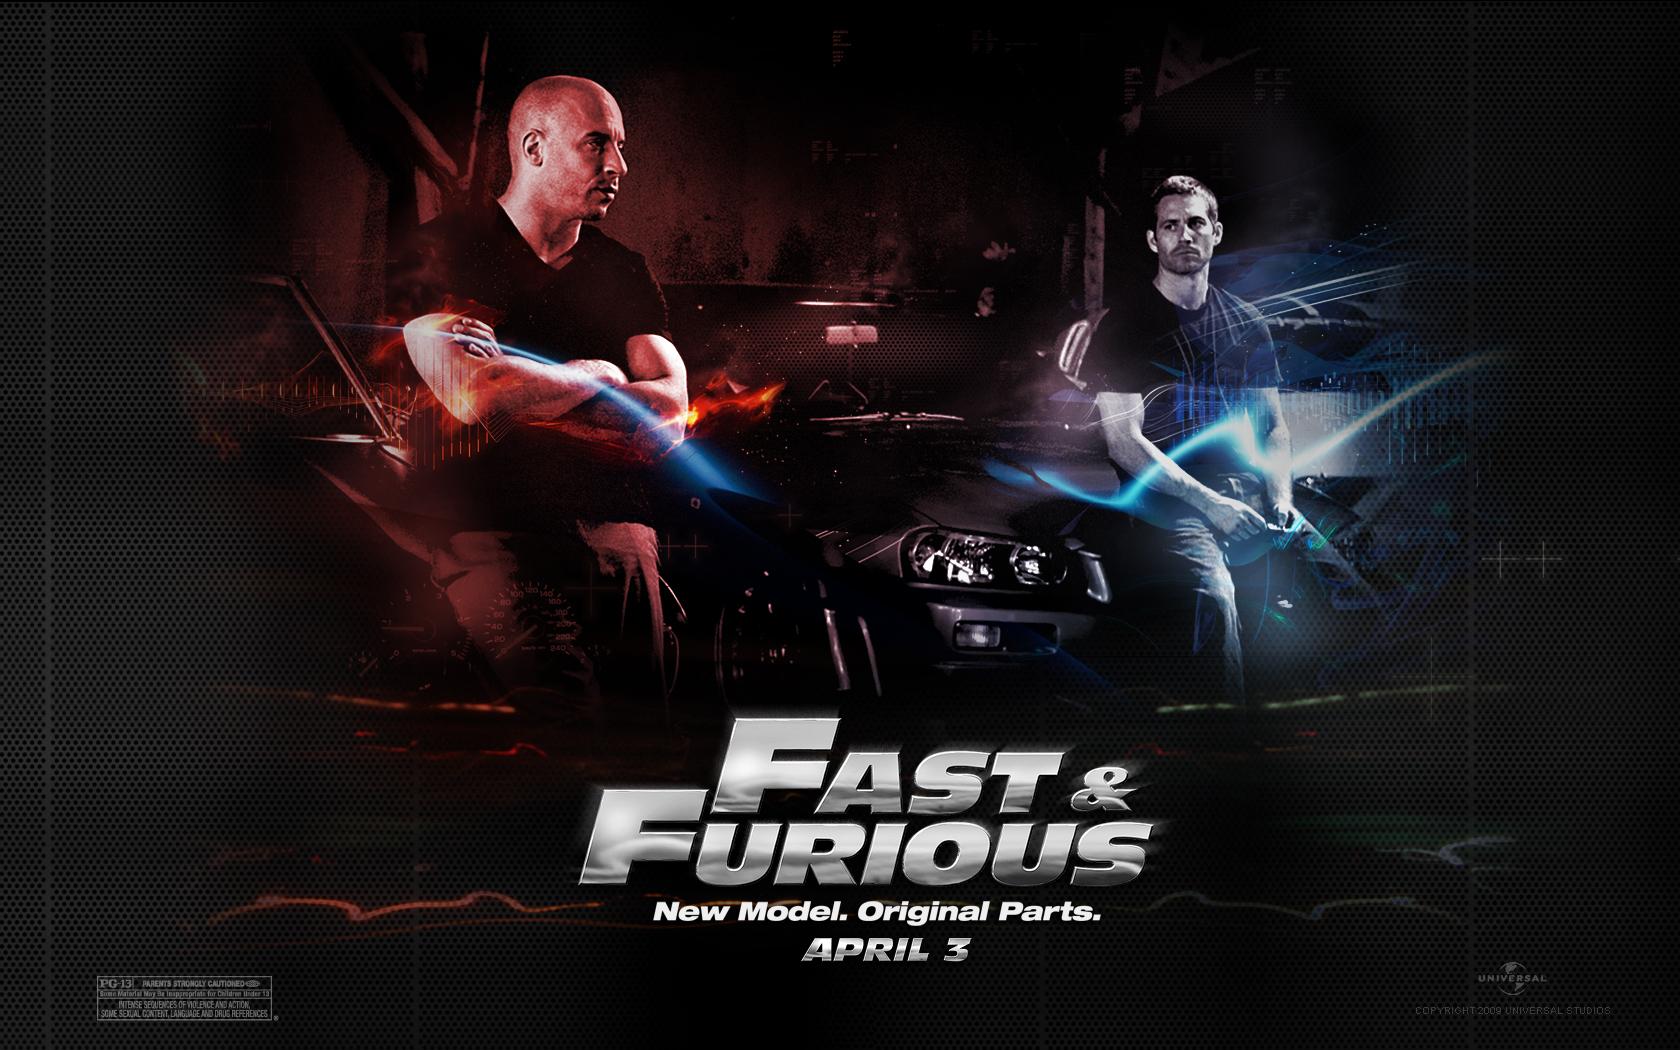 album and fast fast and furious fast and furious 7 fast and furious 1680x1050